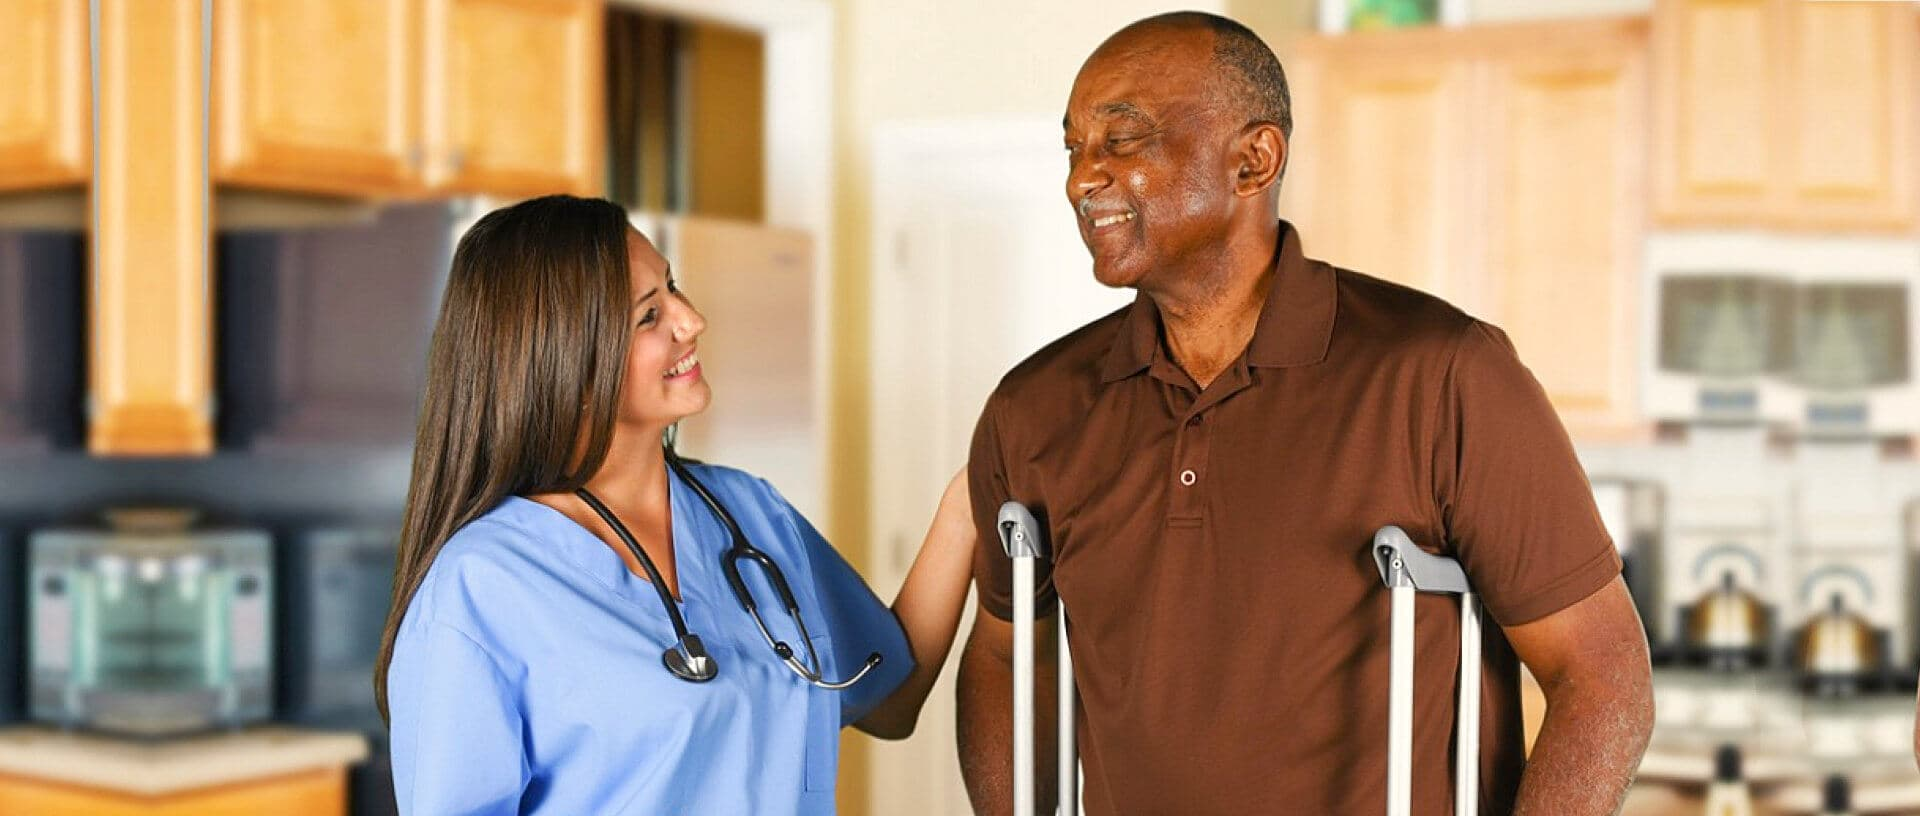 nurse and senior man are smiling